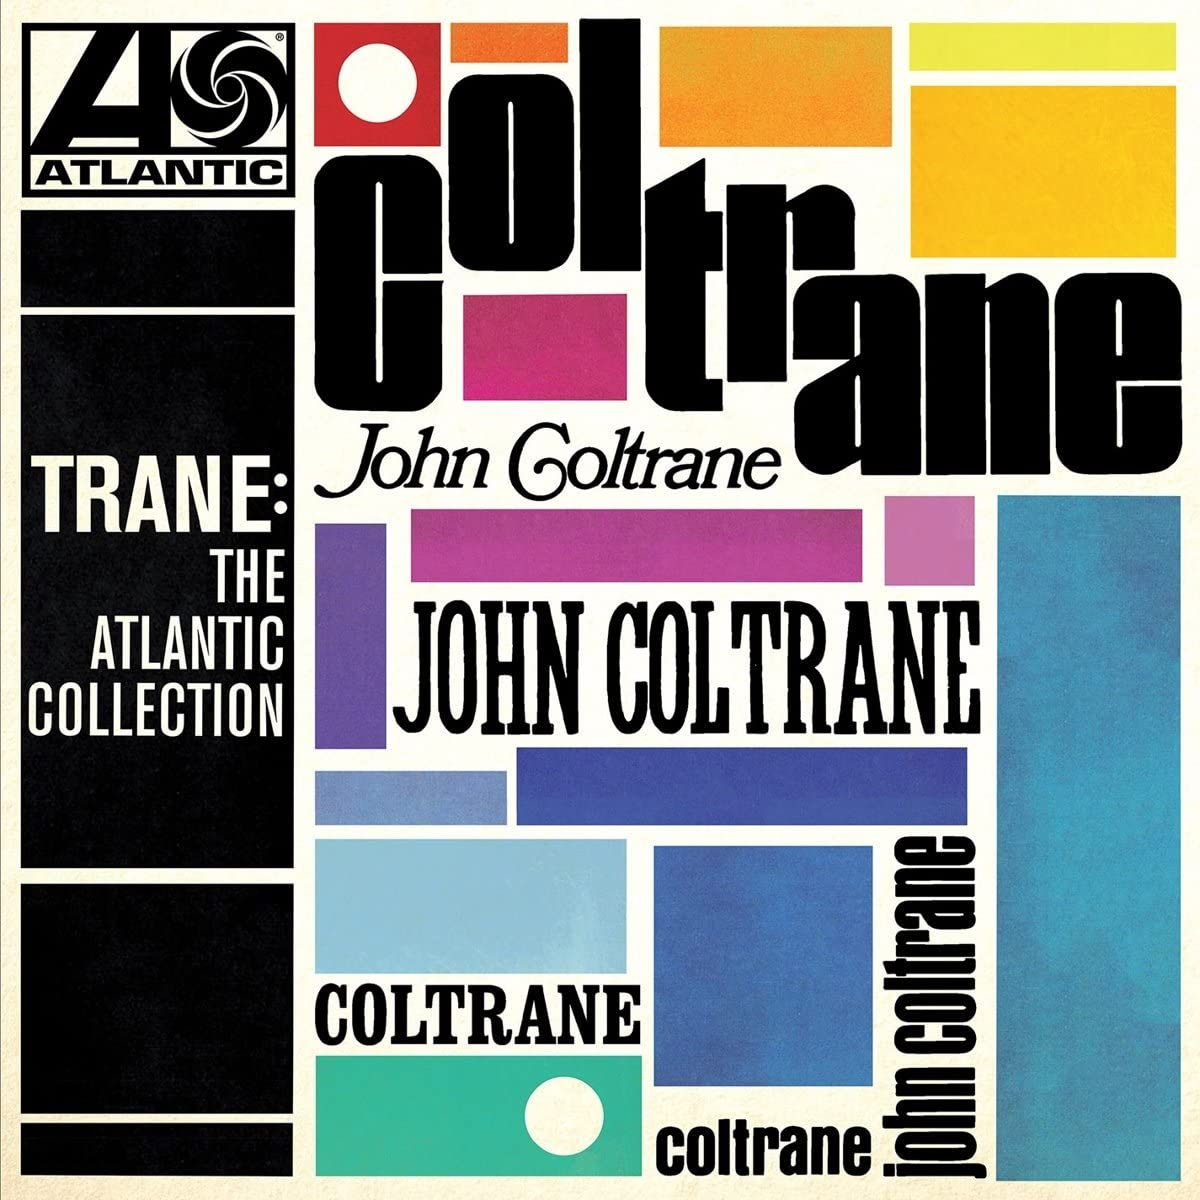 John Coltrane - Trane, The Atlantic Collection